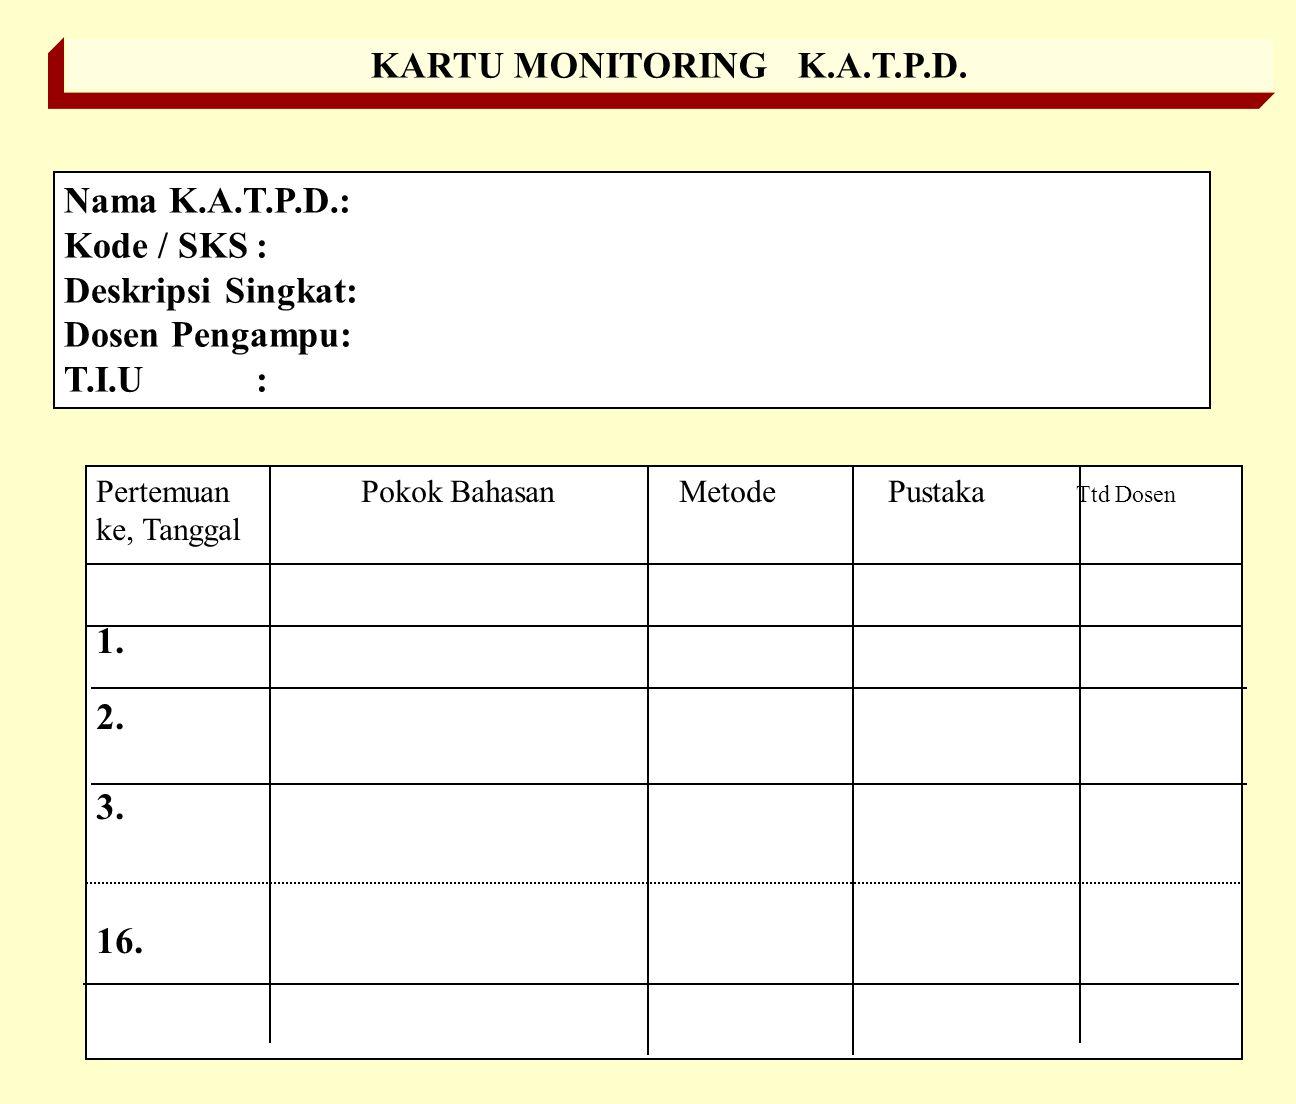 GBPP : GARIS-GARIS BESAR PROGRAM PENGAJARAN Nama K.A.T.P.D.: Kode / SKS: Deskripsi Singkat: Dosen Pengampu: T.I.U: No. T.I.K.Pokok Bahasan Metode/ Wak